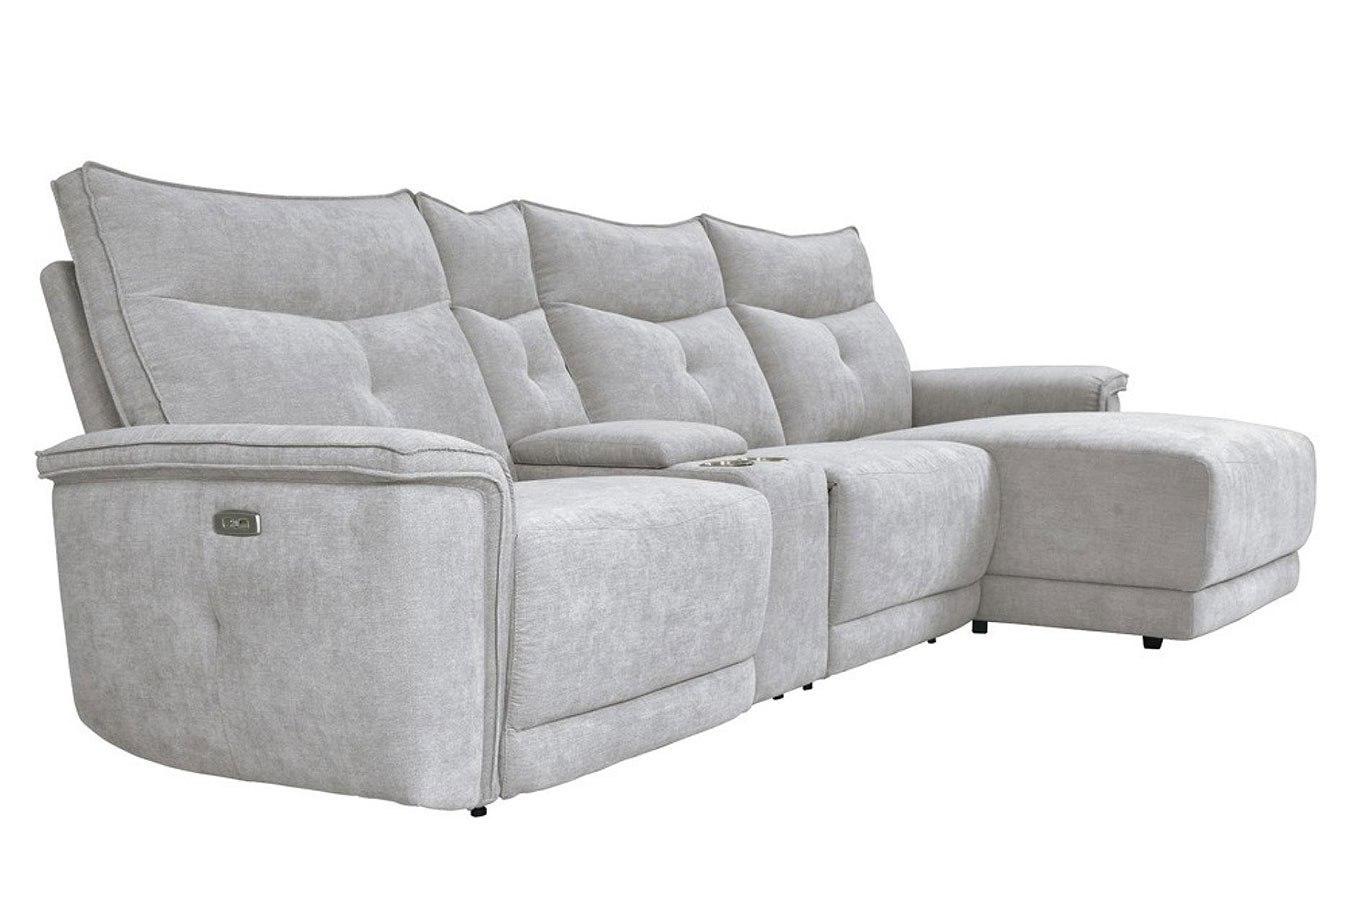 Tesoro Modular Reclining Sofa Chaise